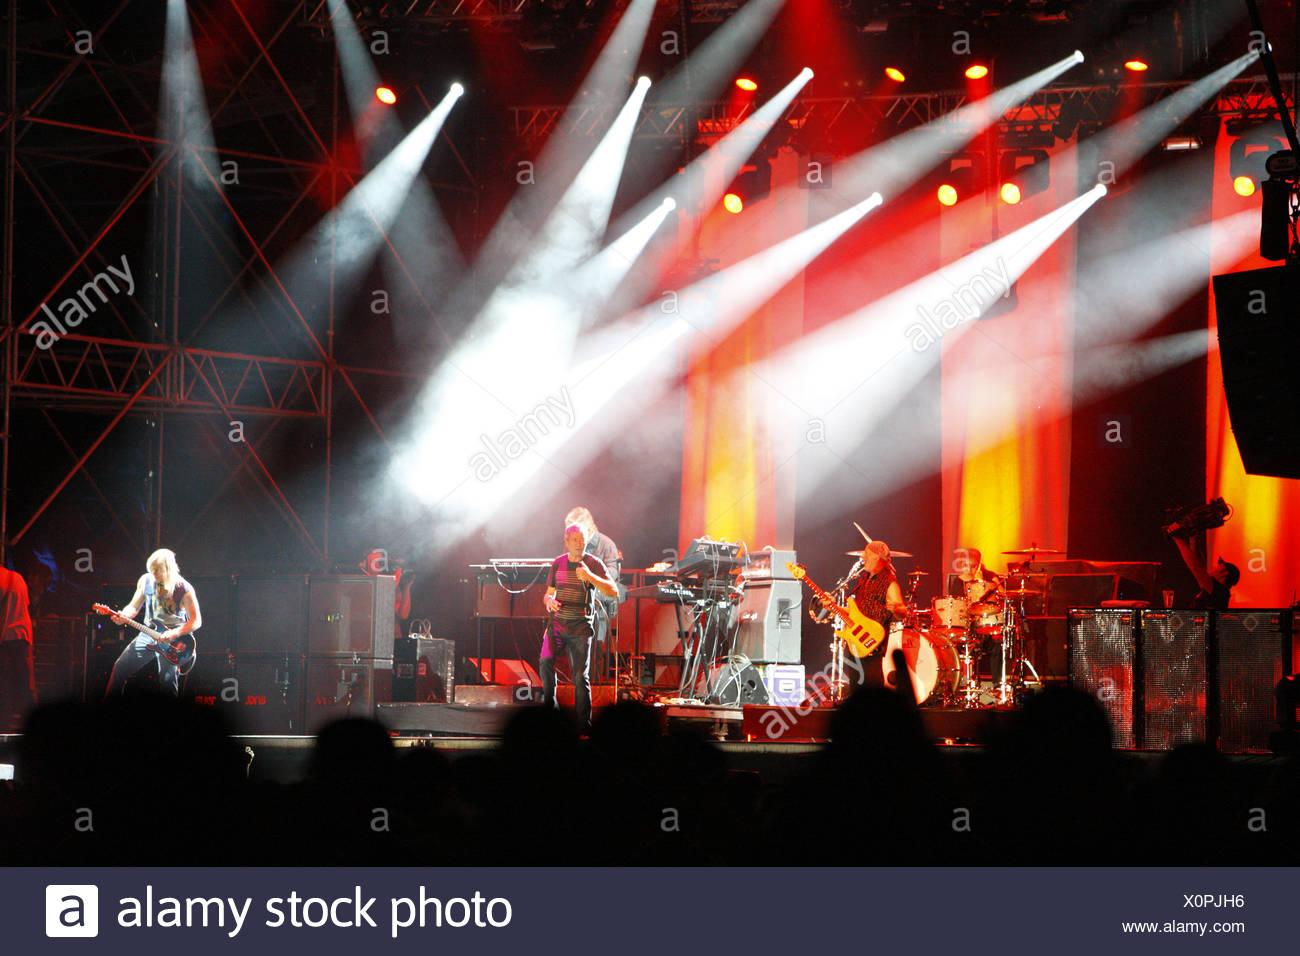 Deep Purple, English rock band, Open Air Festival, Muehldorf am Inn, Bavaria, Germany Stock Photo